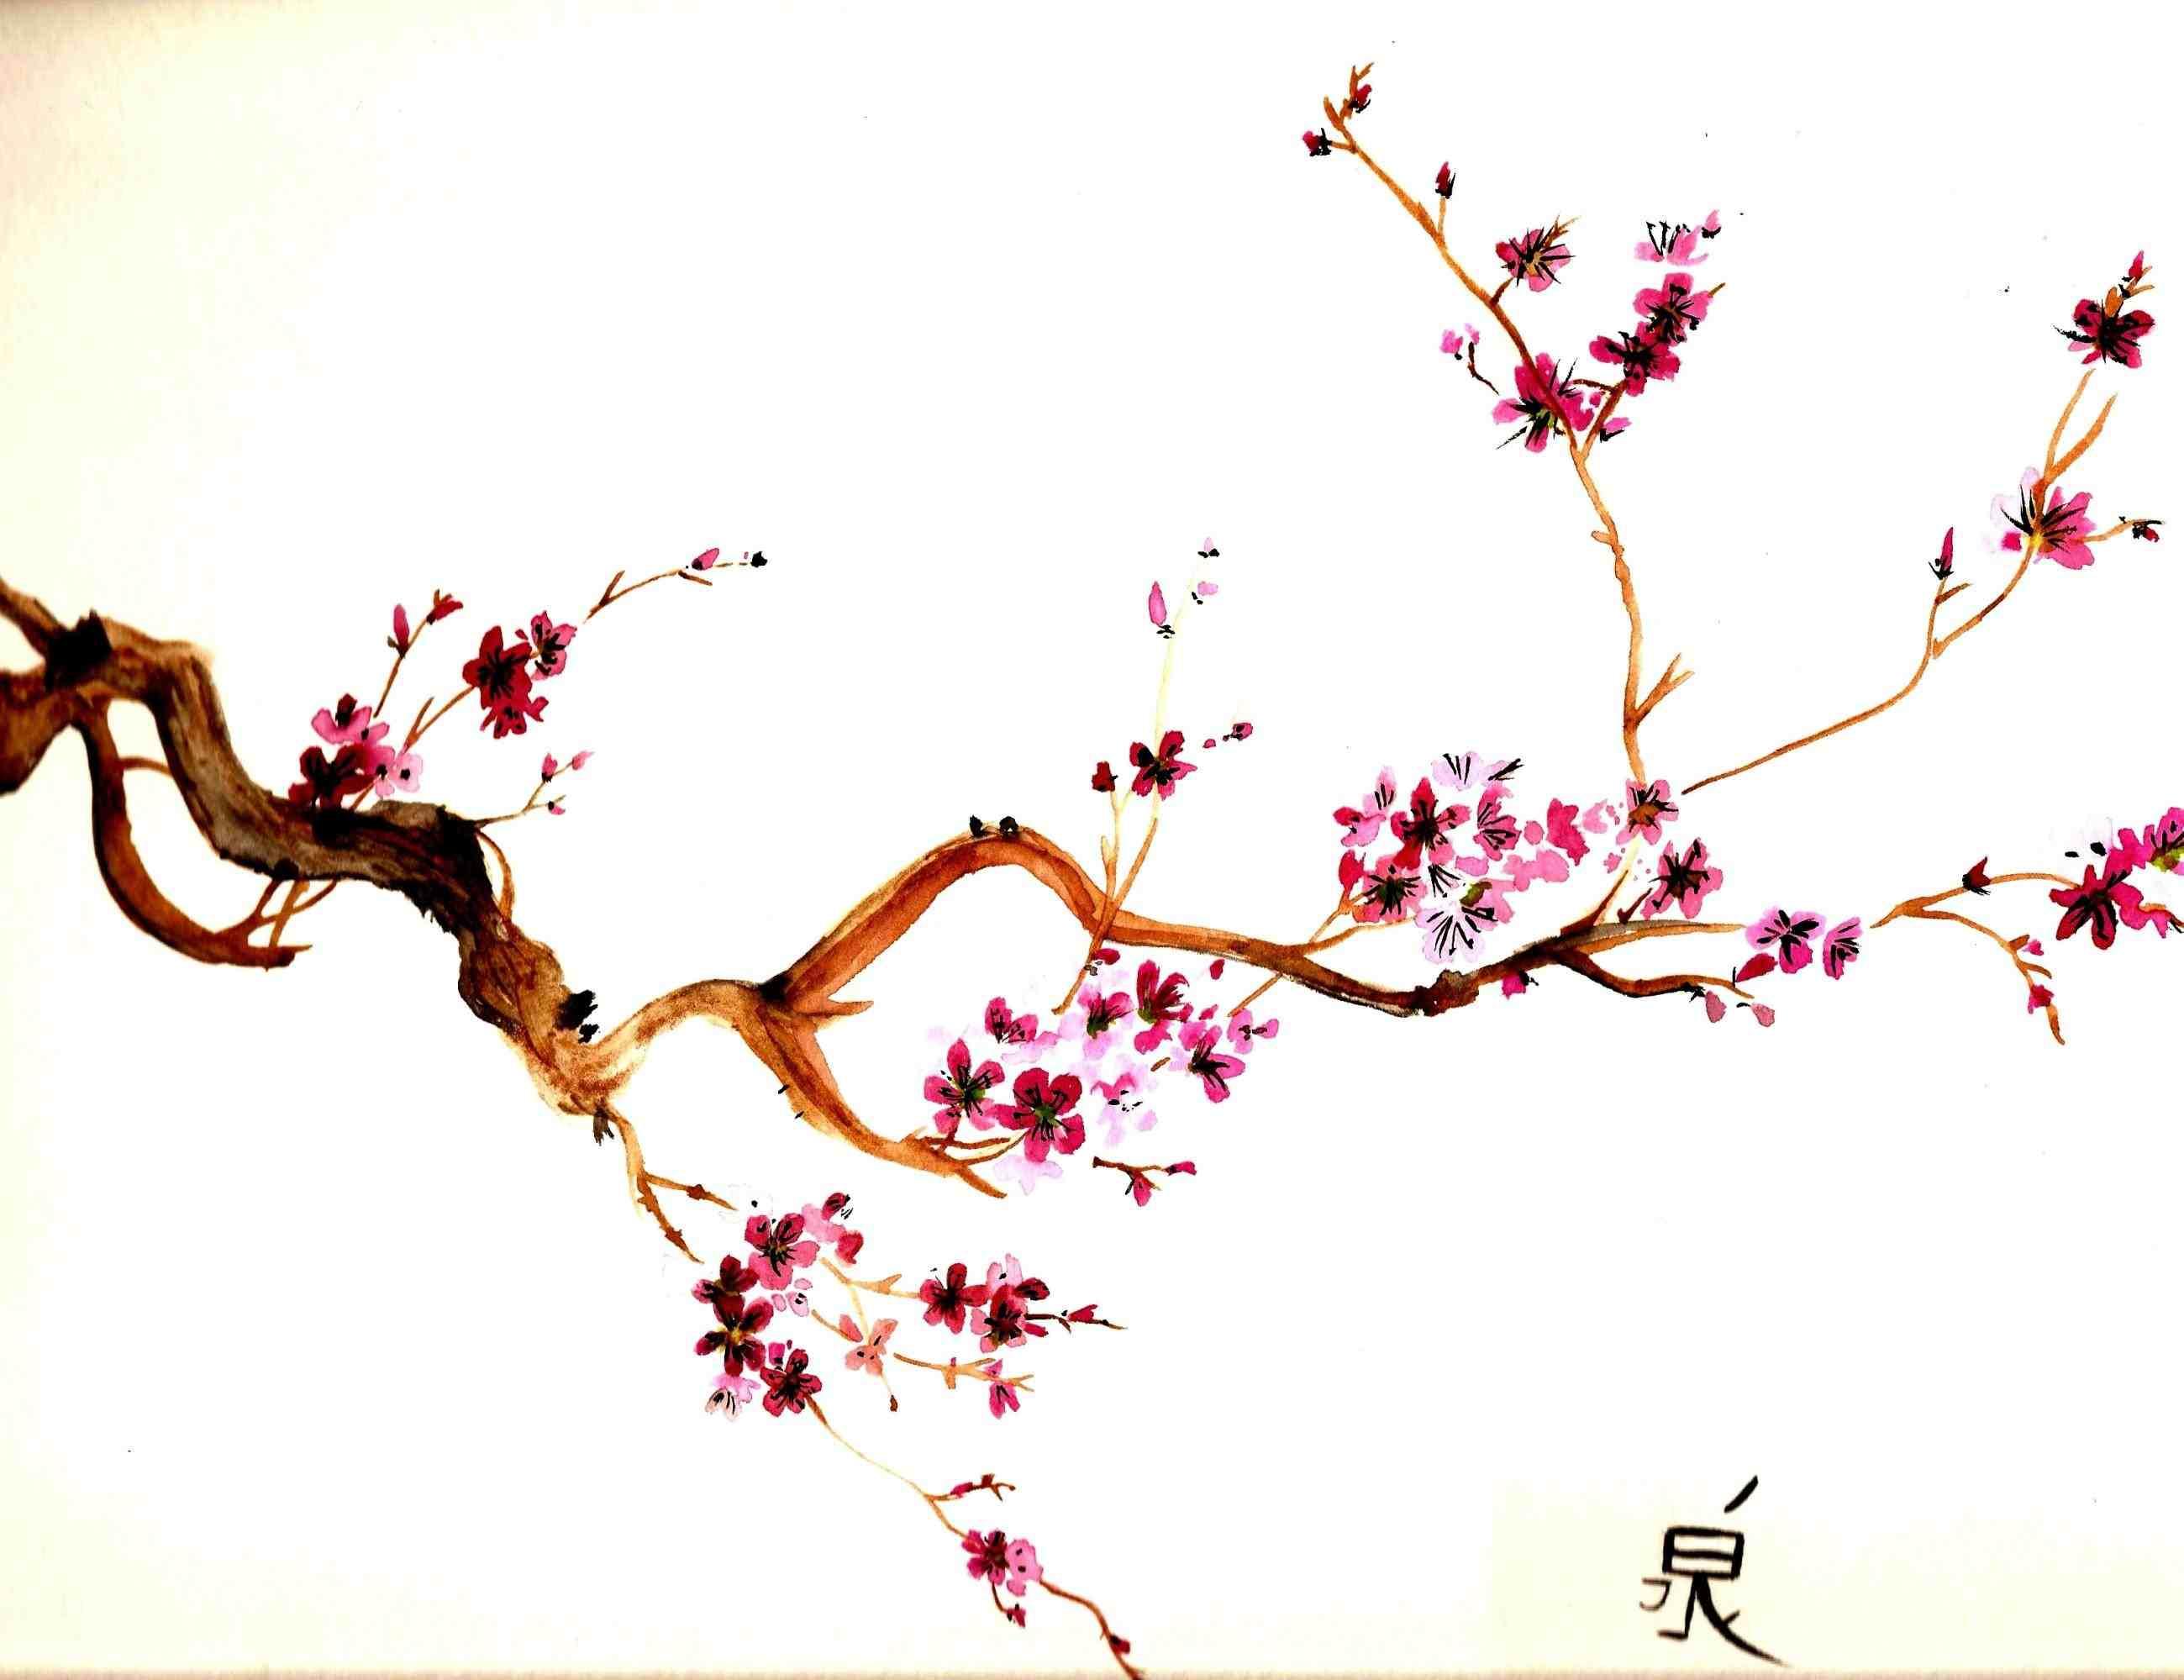 Drawn sakura blossom single Drawing single online Download blossom